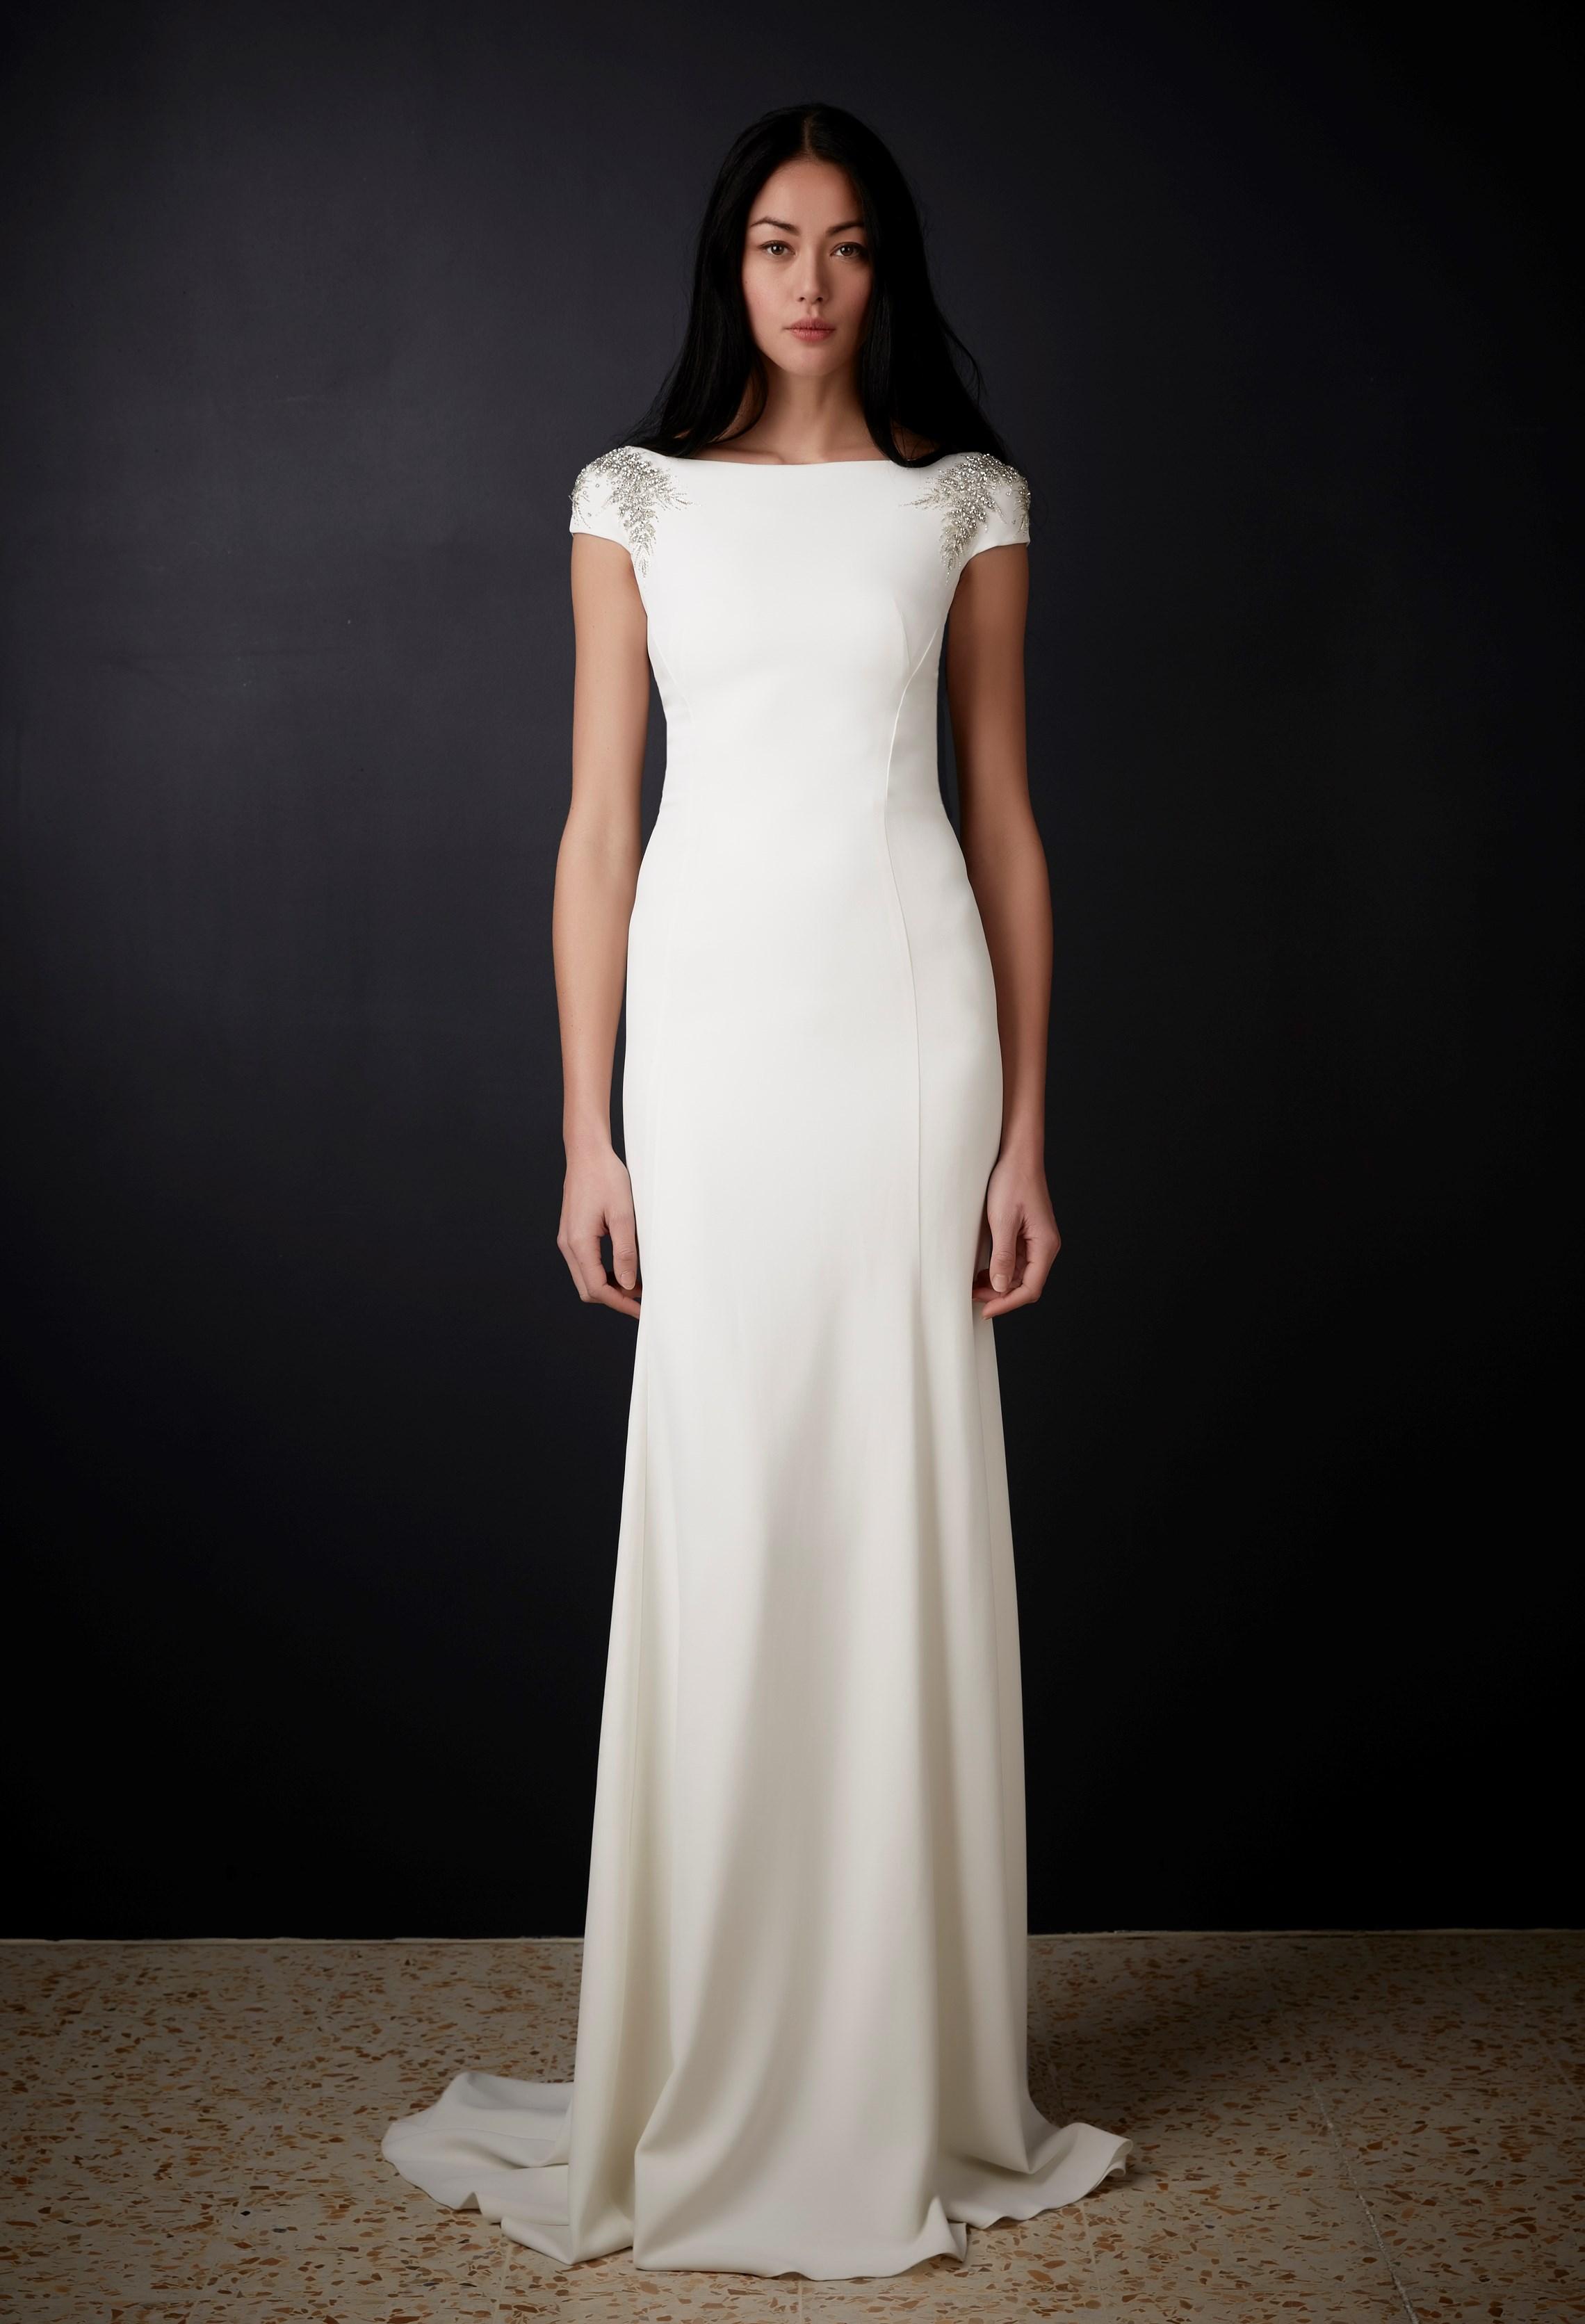 Fern Wedding Dress by Jenny Packham | Northern Ireland